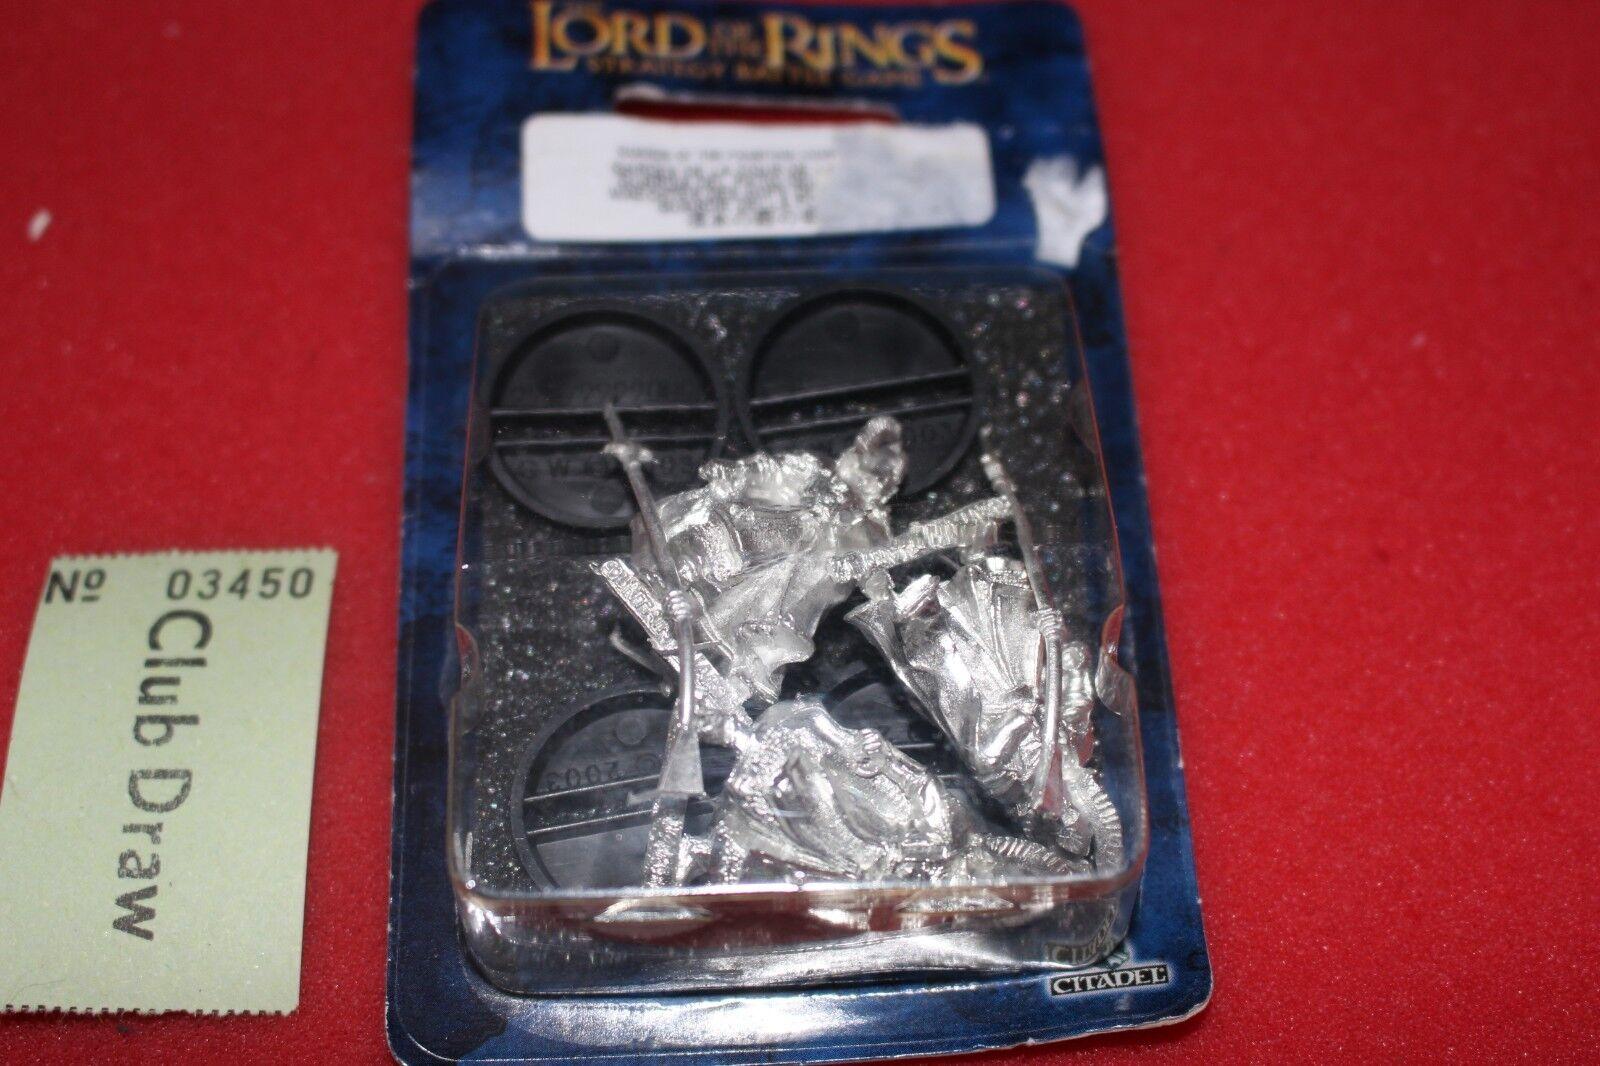 Games Workshop Lord of the Rings Fountain Guards BNIB LoTR Metal Figures Gondor